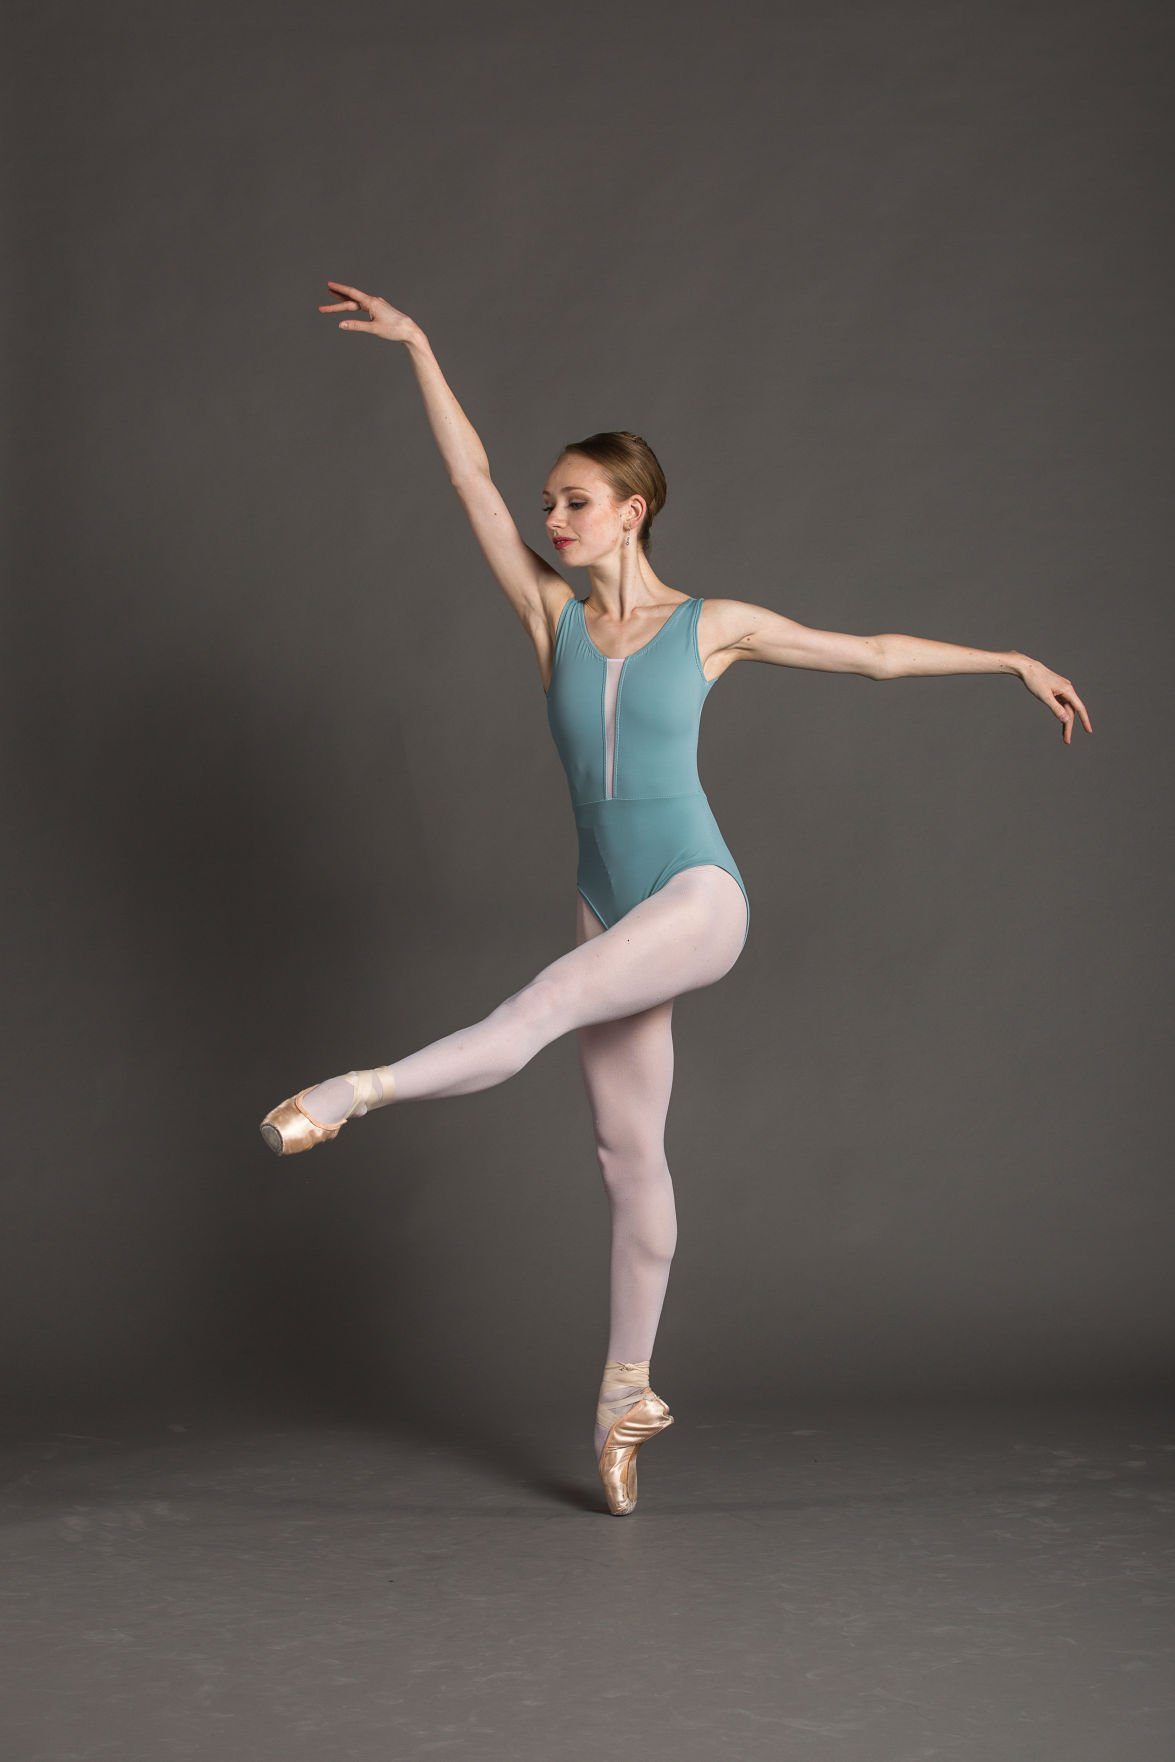 Cuban Ballet Dancers in the World » LaHabana.com